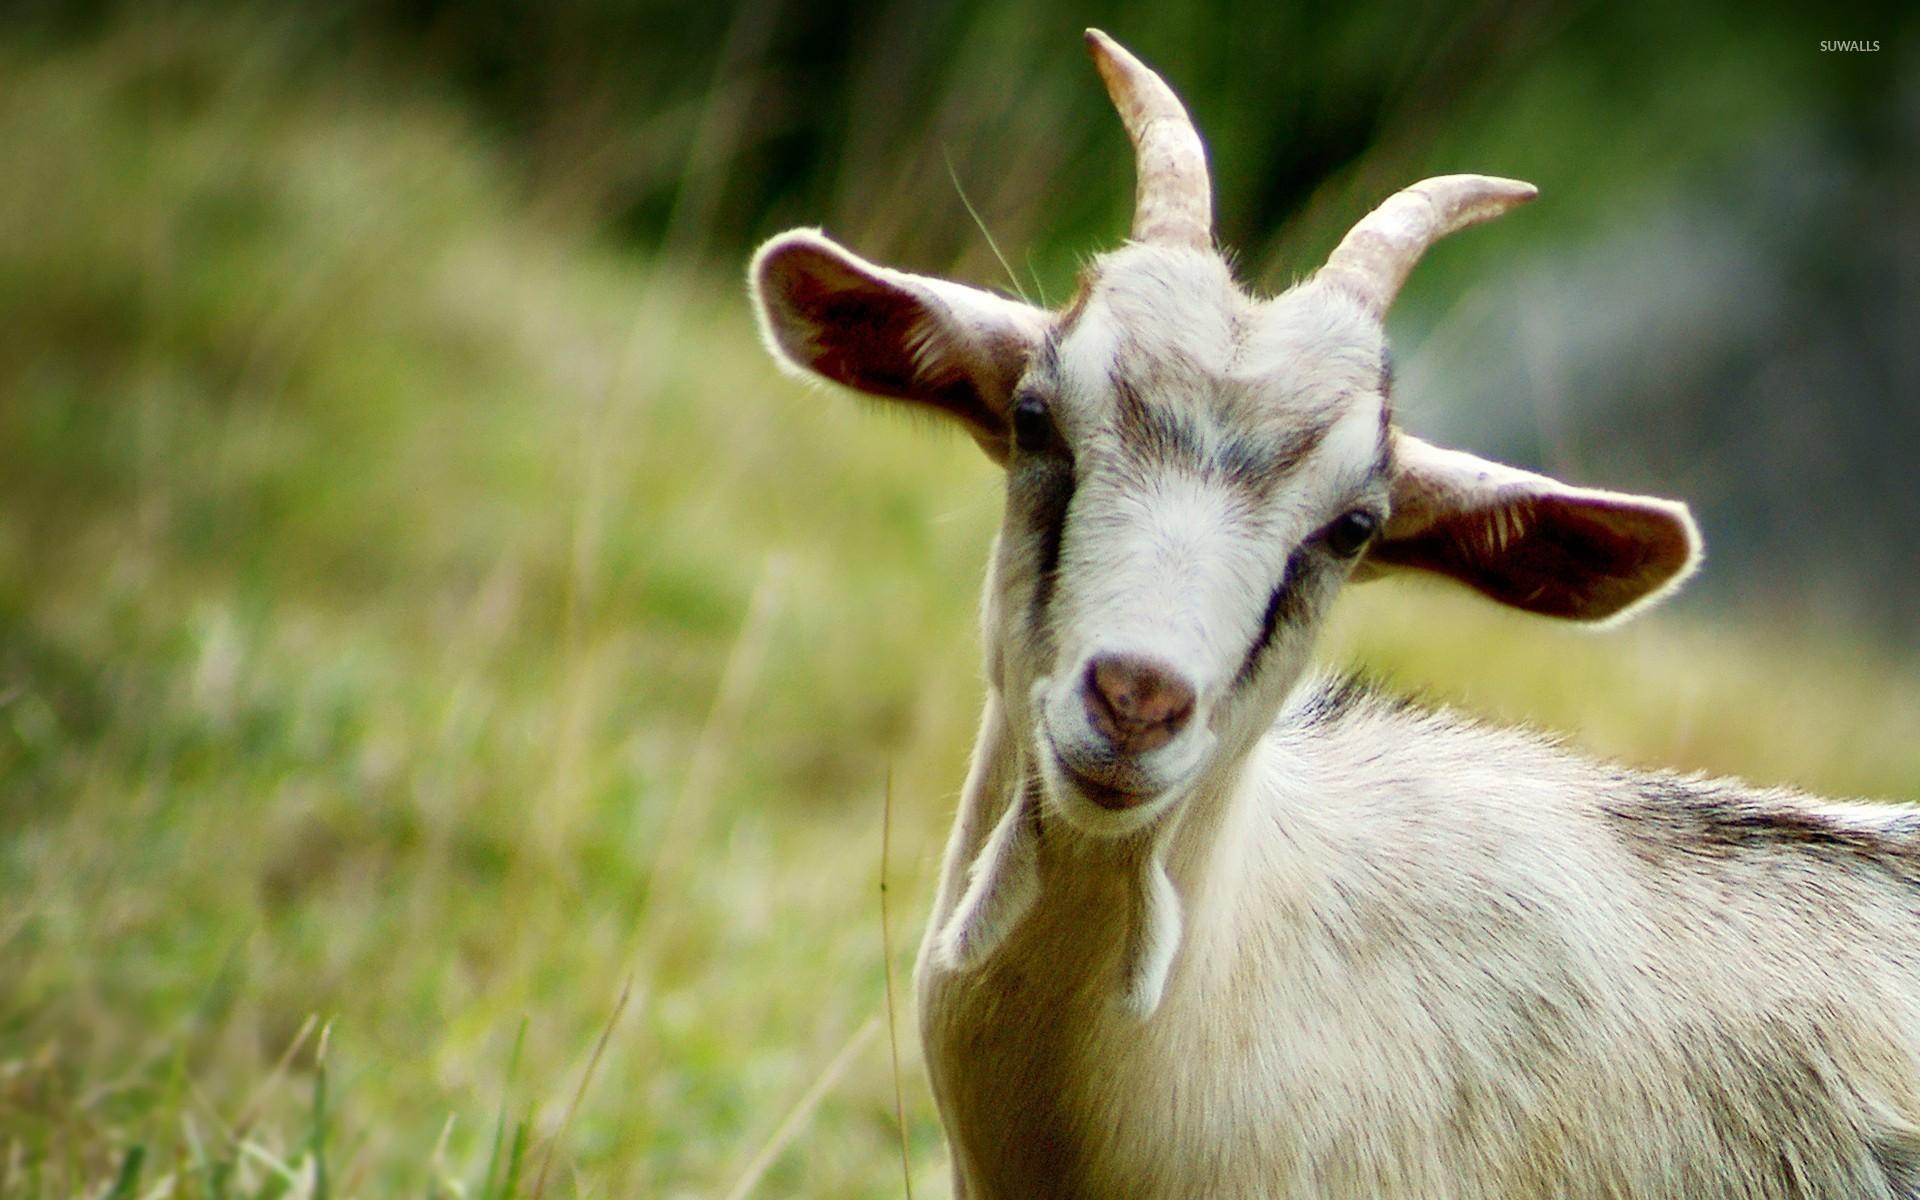 smiling goat wallpaper animal wallpapers 25770